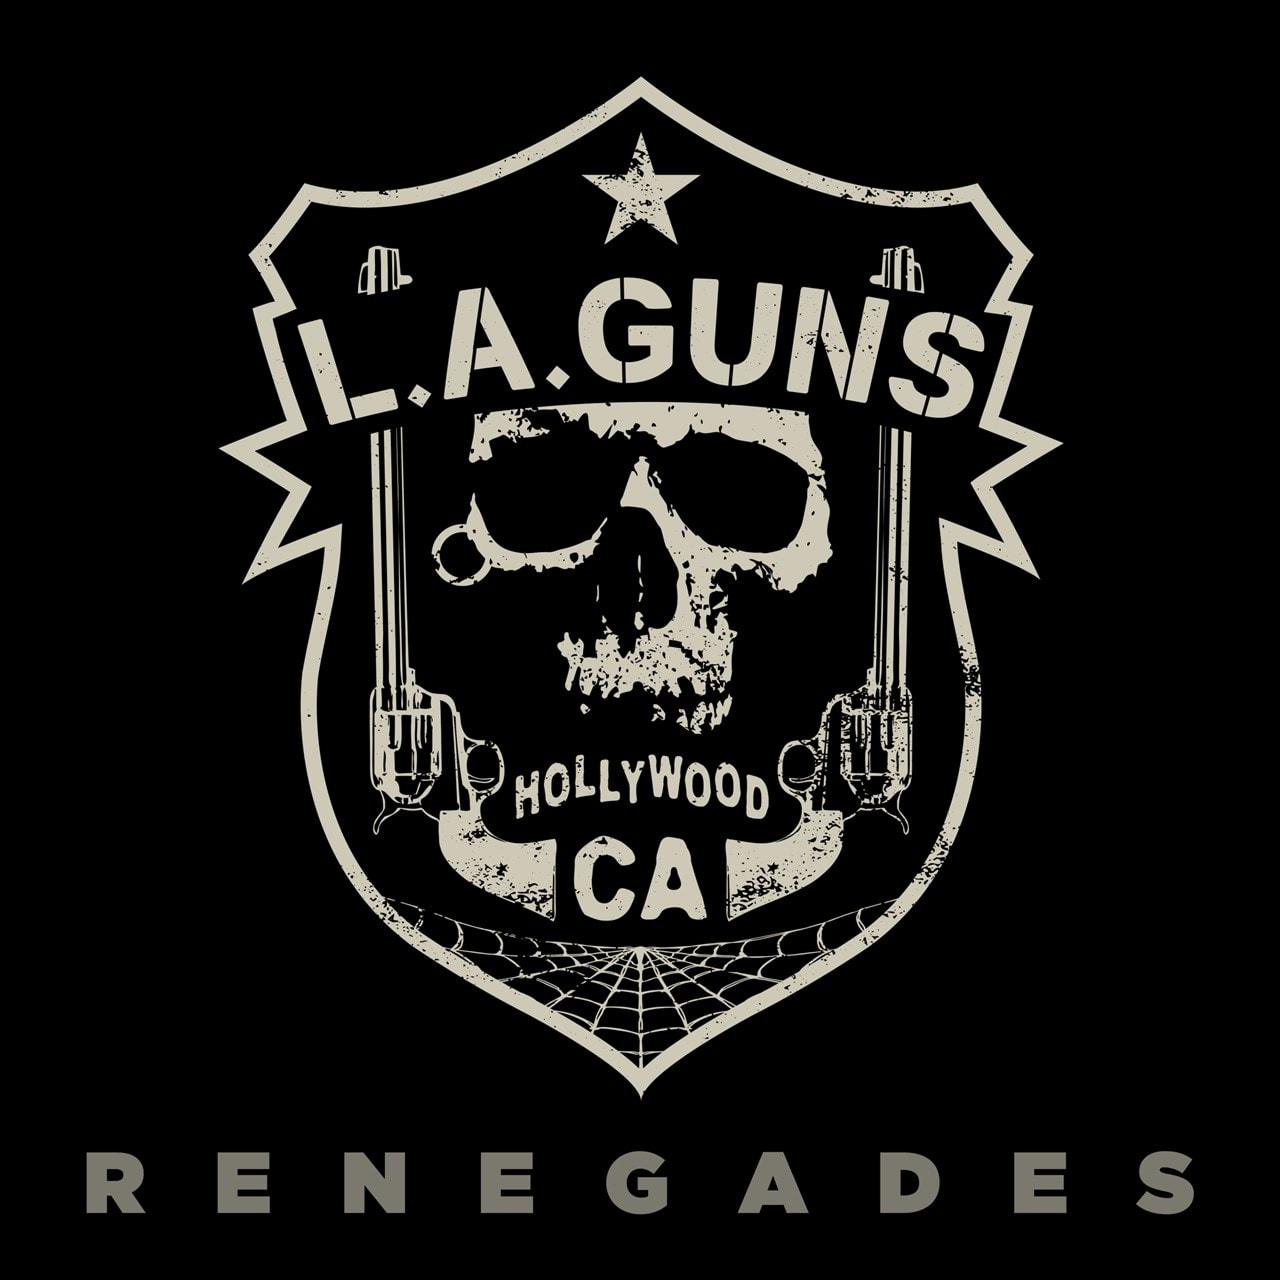 Renegades - 1